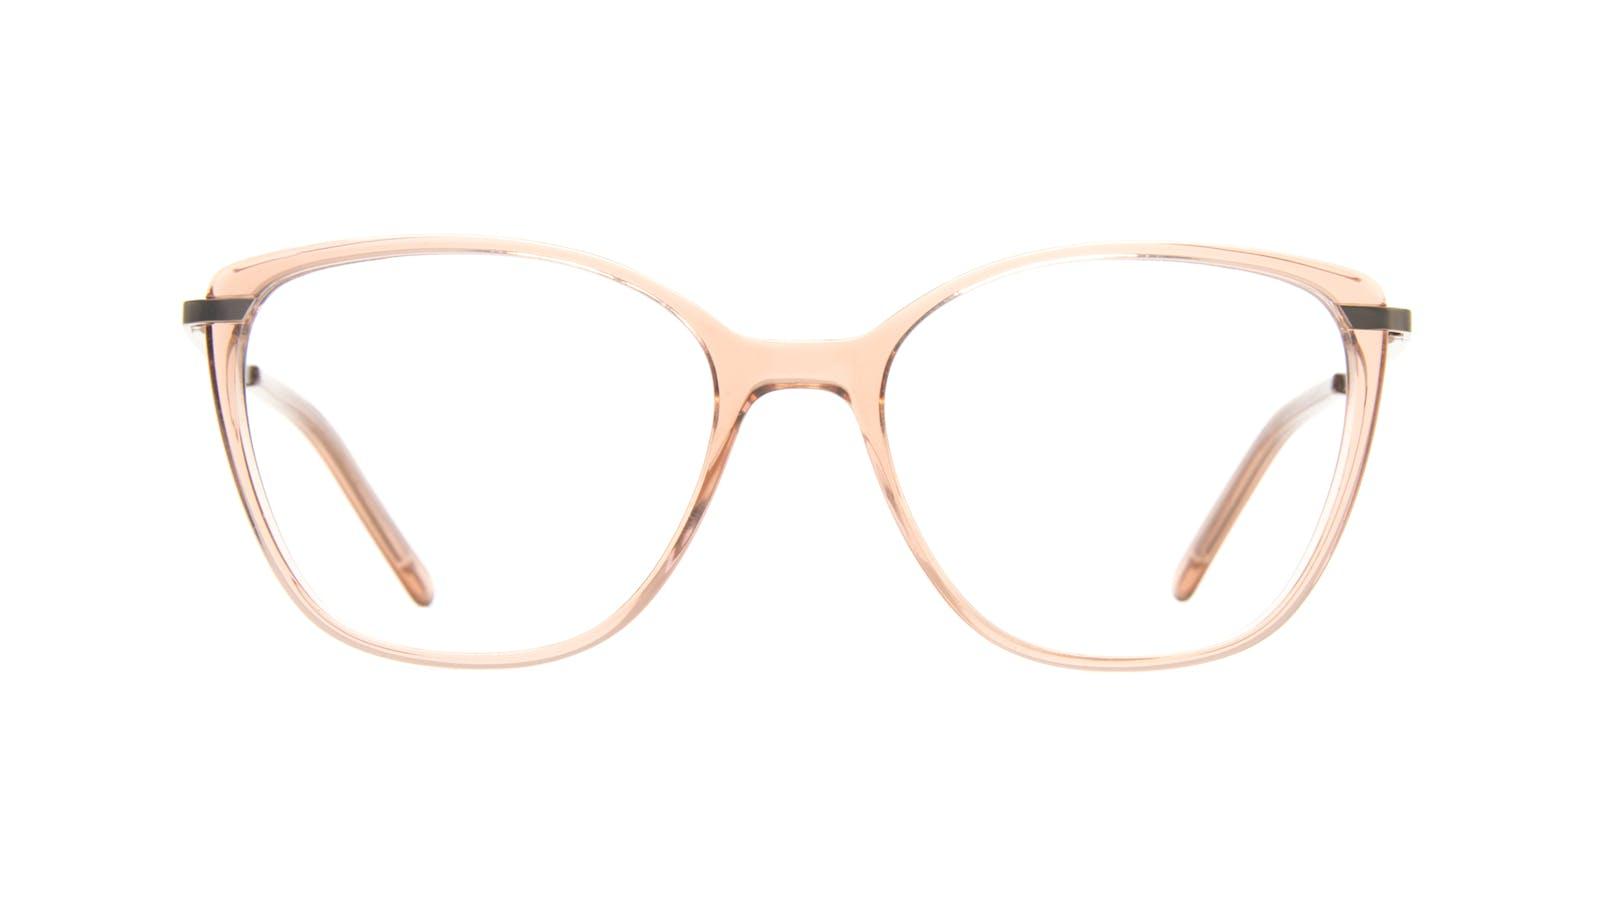 000509429a7 Affordable Fashion Glasses Cat Eye Rectangle Square Eyeglasses Women  Illusion Rose